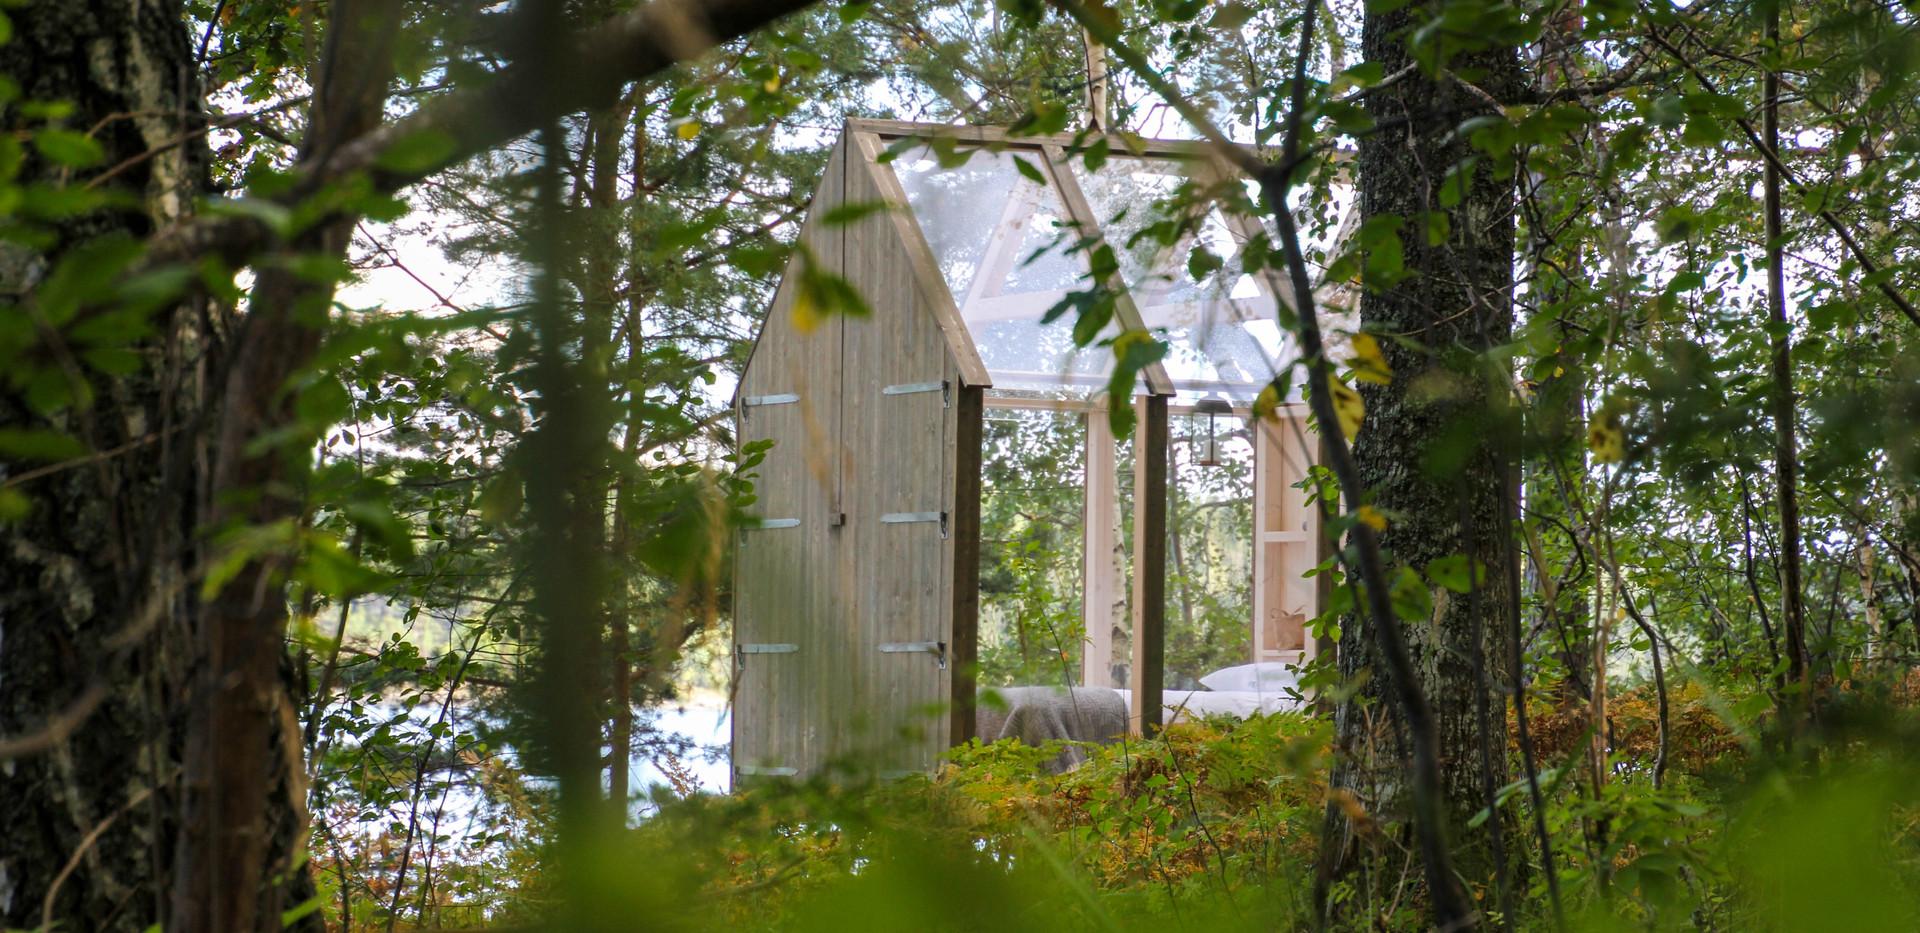 72h Cabin 1 through the trees.jpg